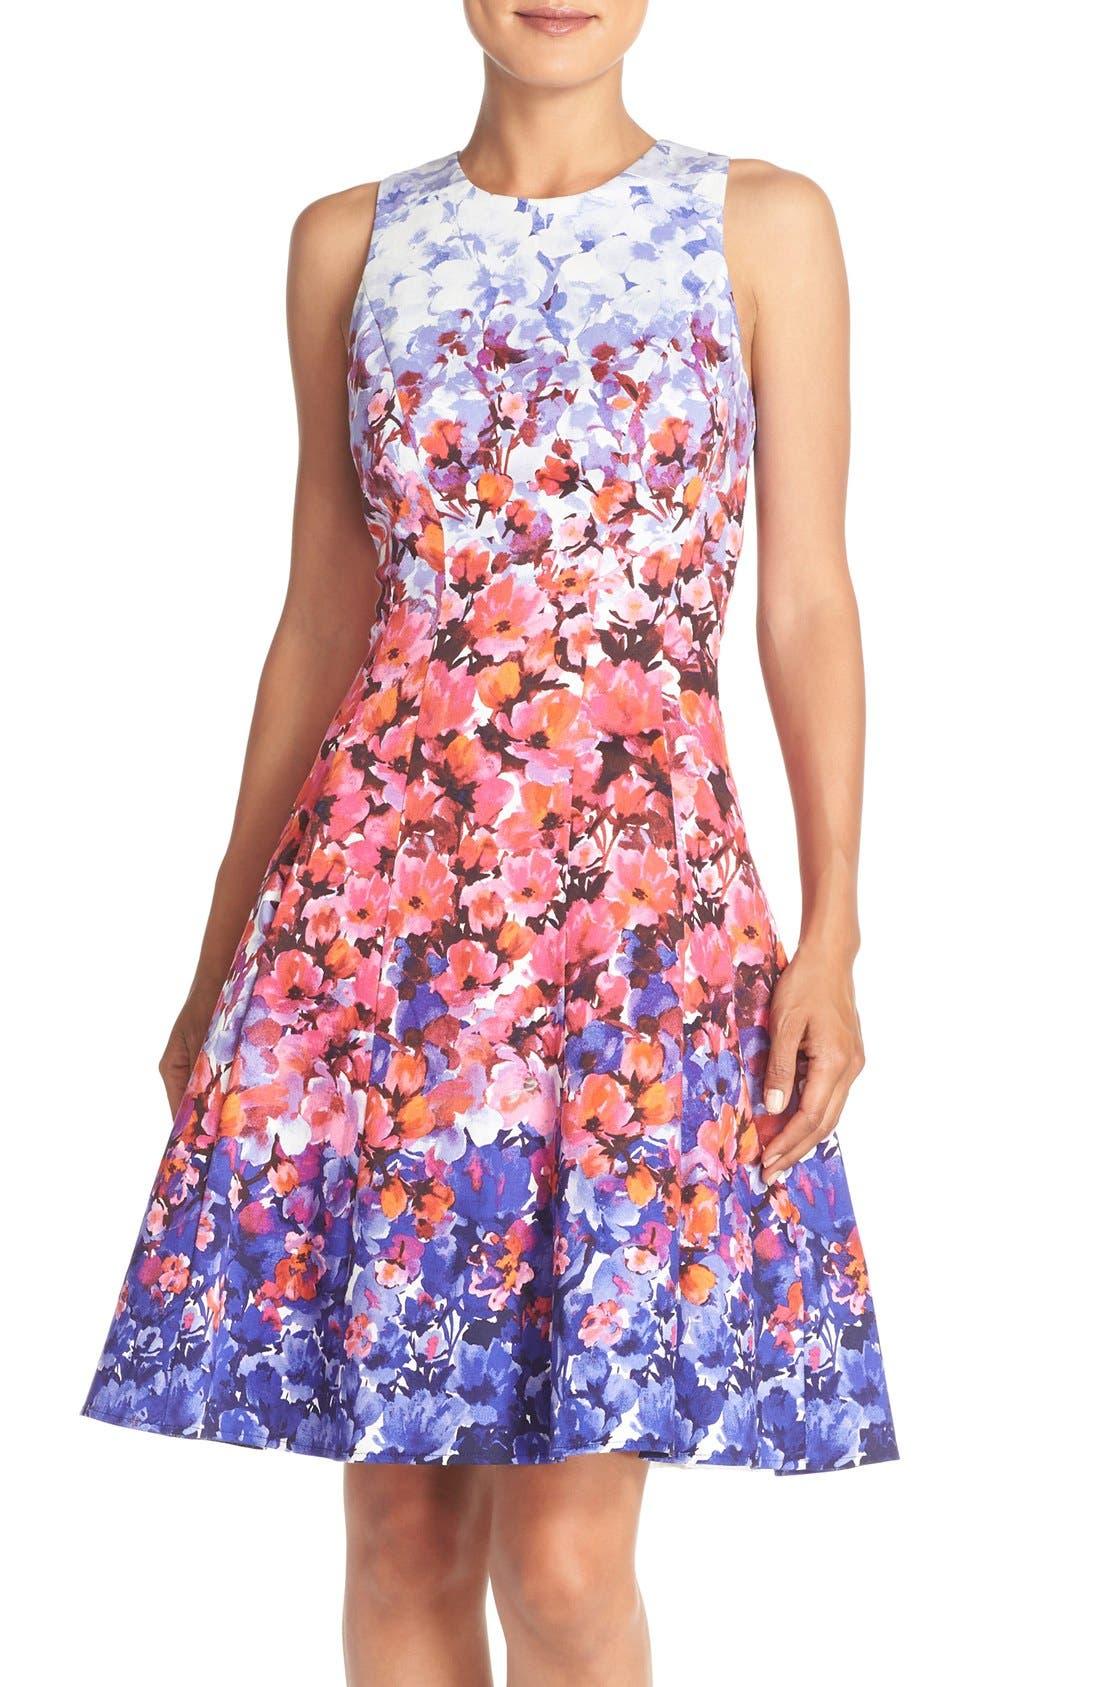 Alternate Image 1 Selected - Maggy London Floral Print Sateen Fit & Flare Dress (Regular & Petite)